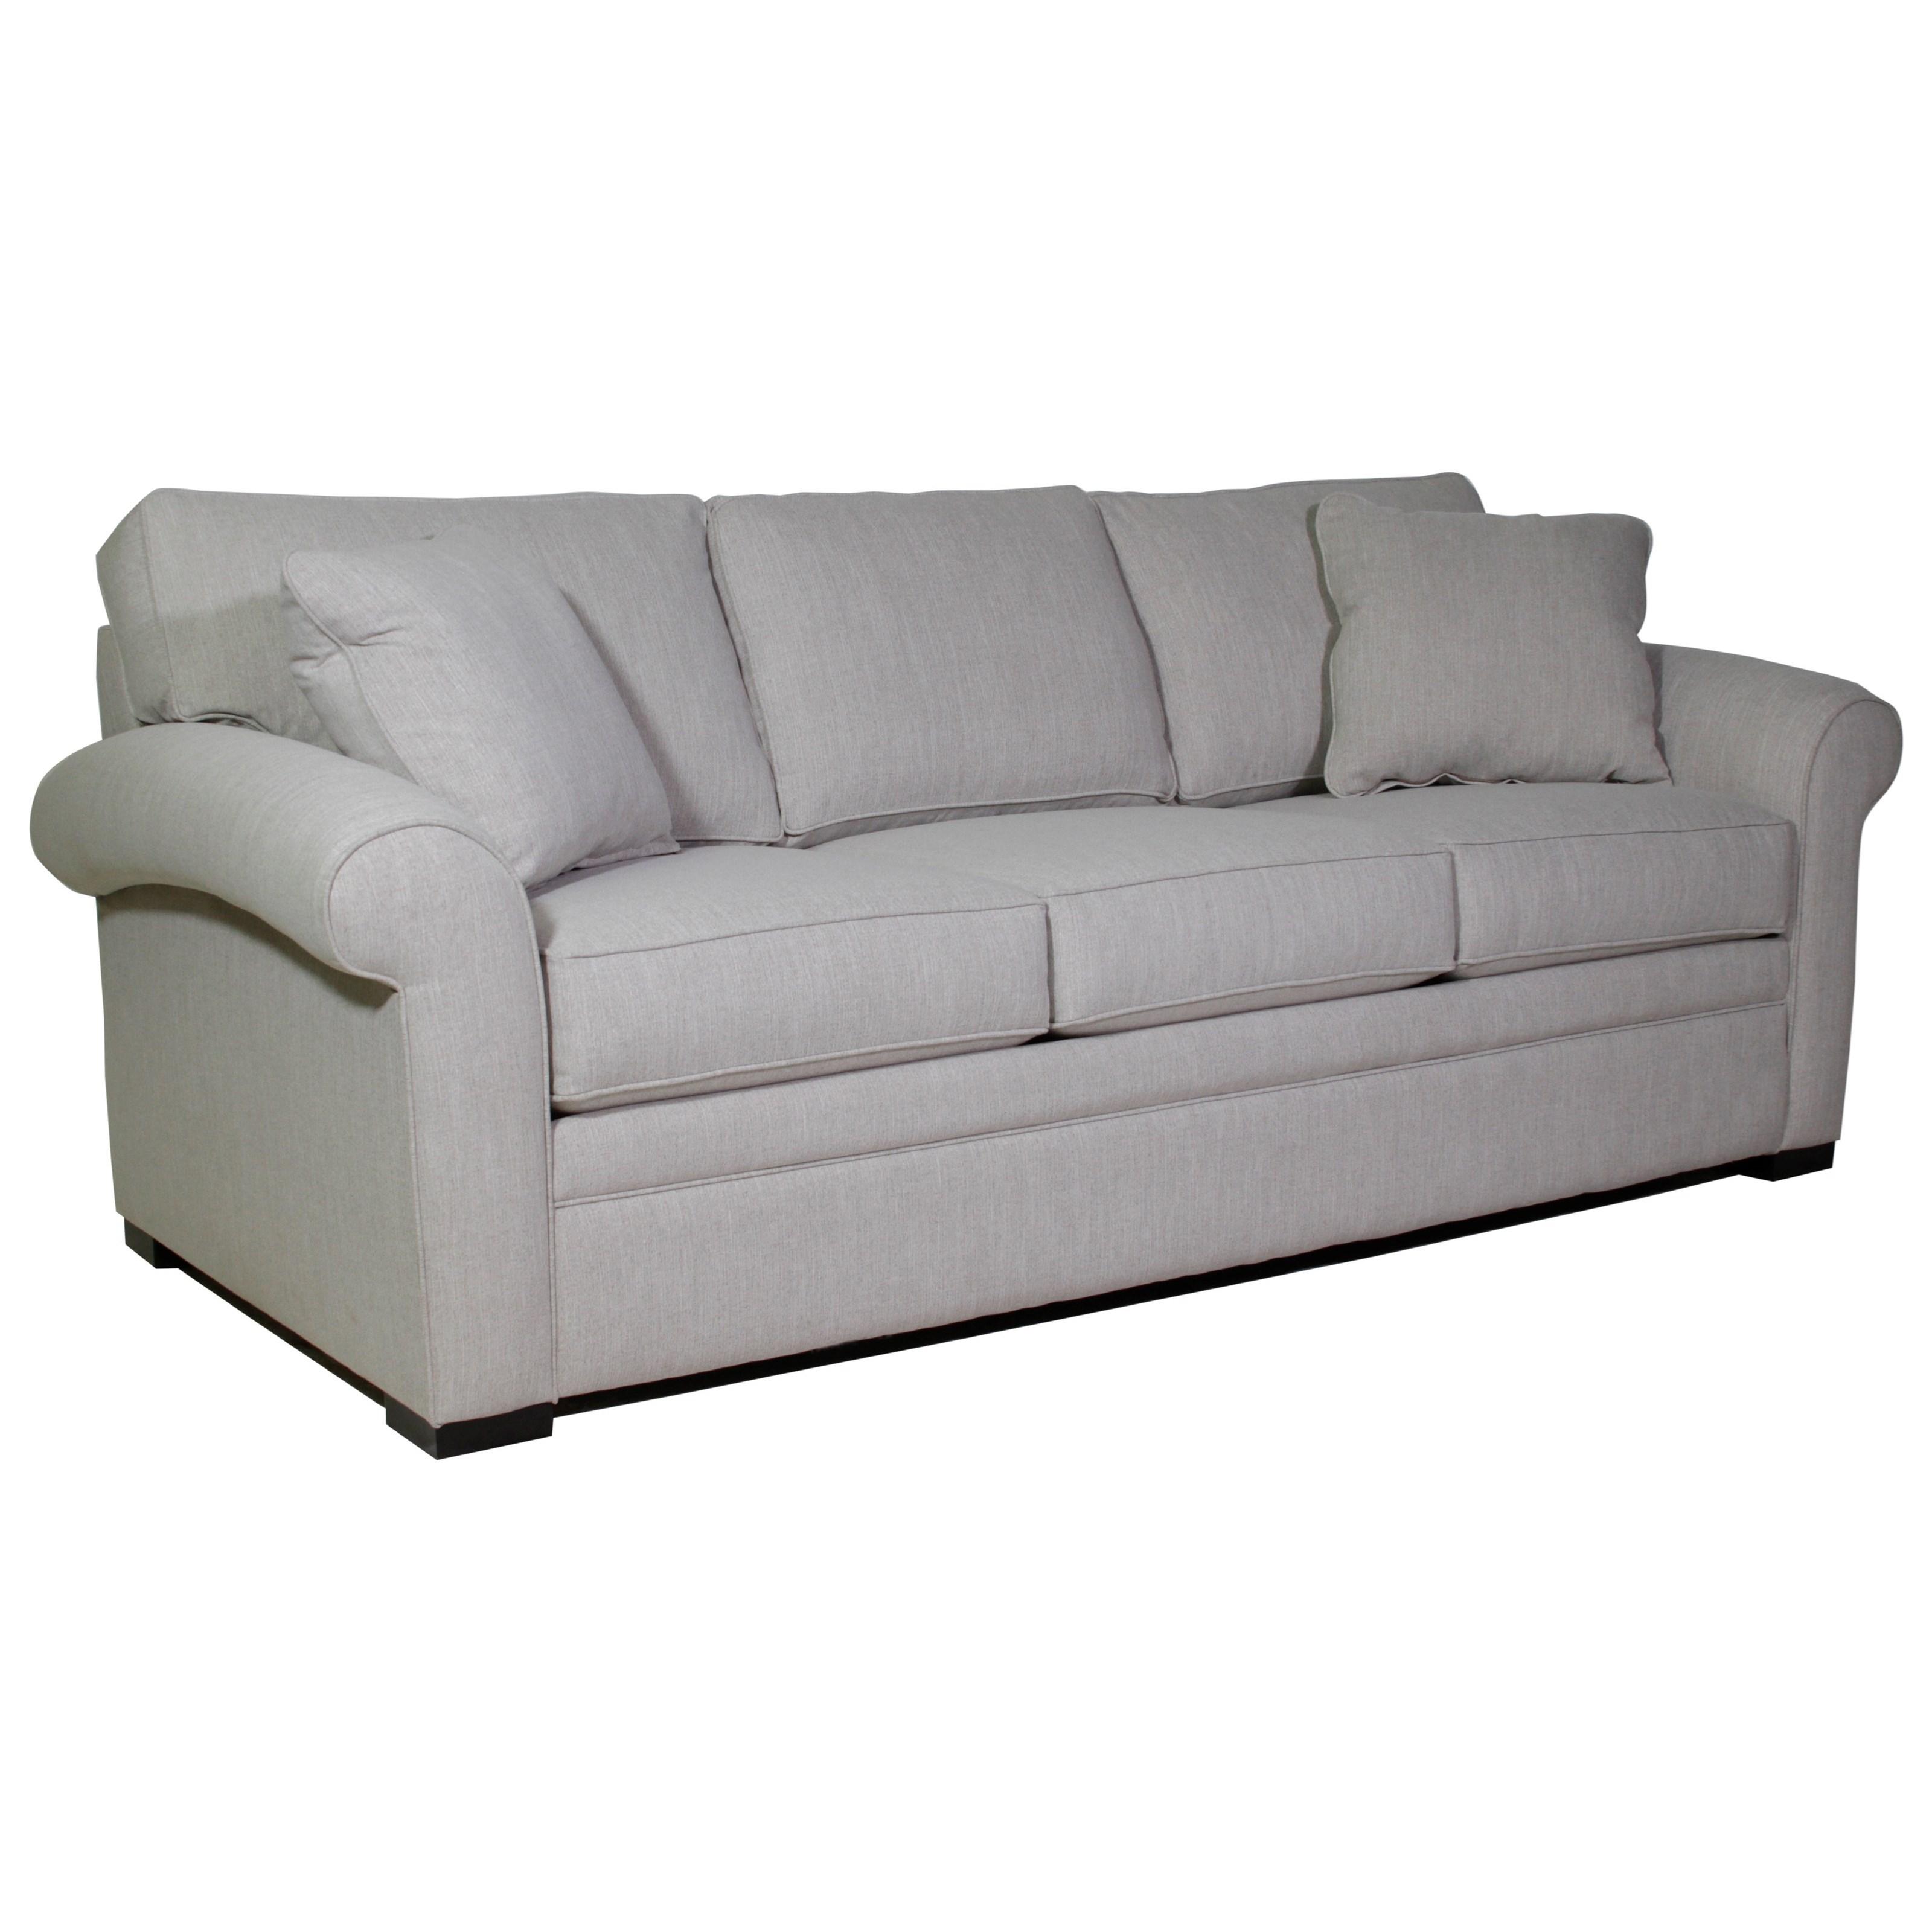 ... Jonathan Louis DozyQueen Inflatable Mattress Sofa Sleeper ...